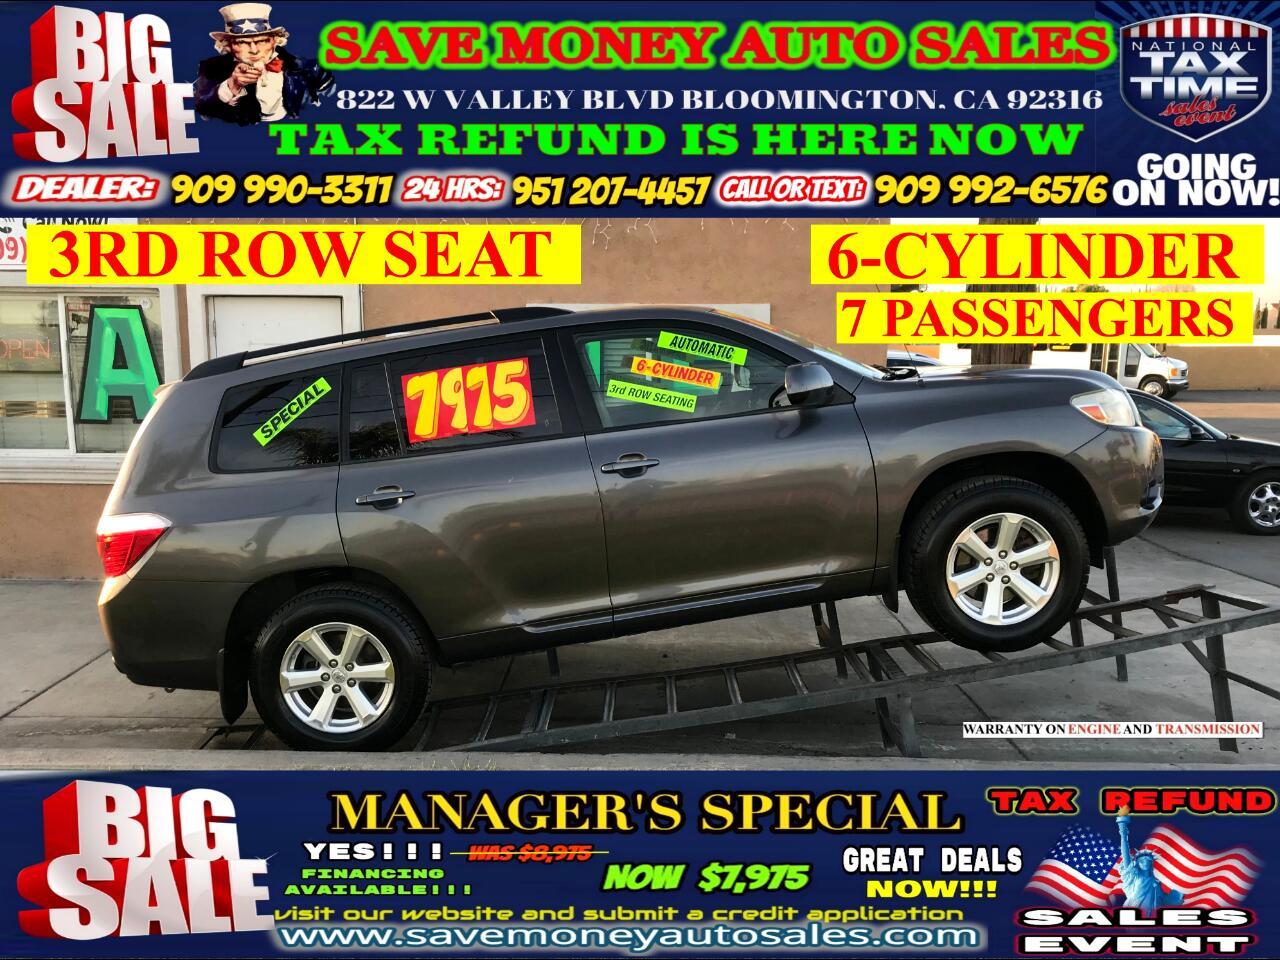 2008 Toyota Highlander 6- CYLINDER> 3RD ROW SEAT> 7 PASSENGERS